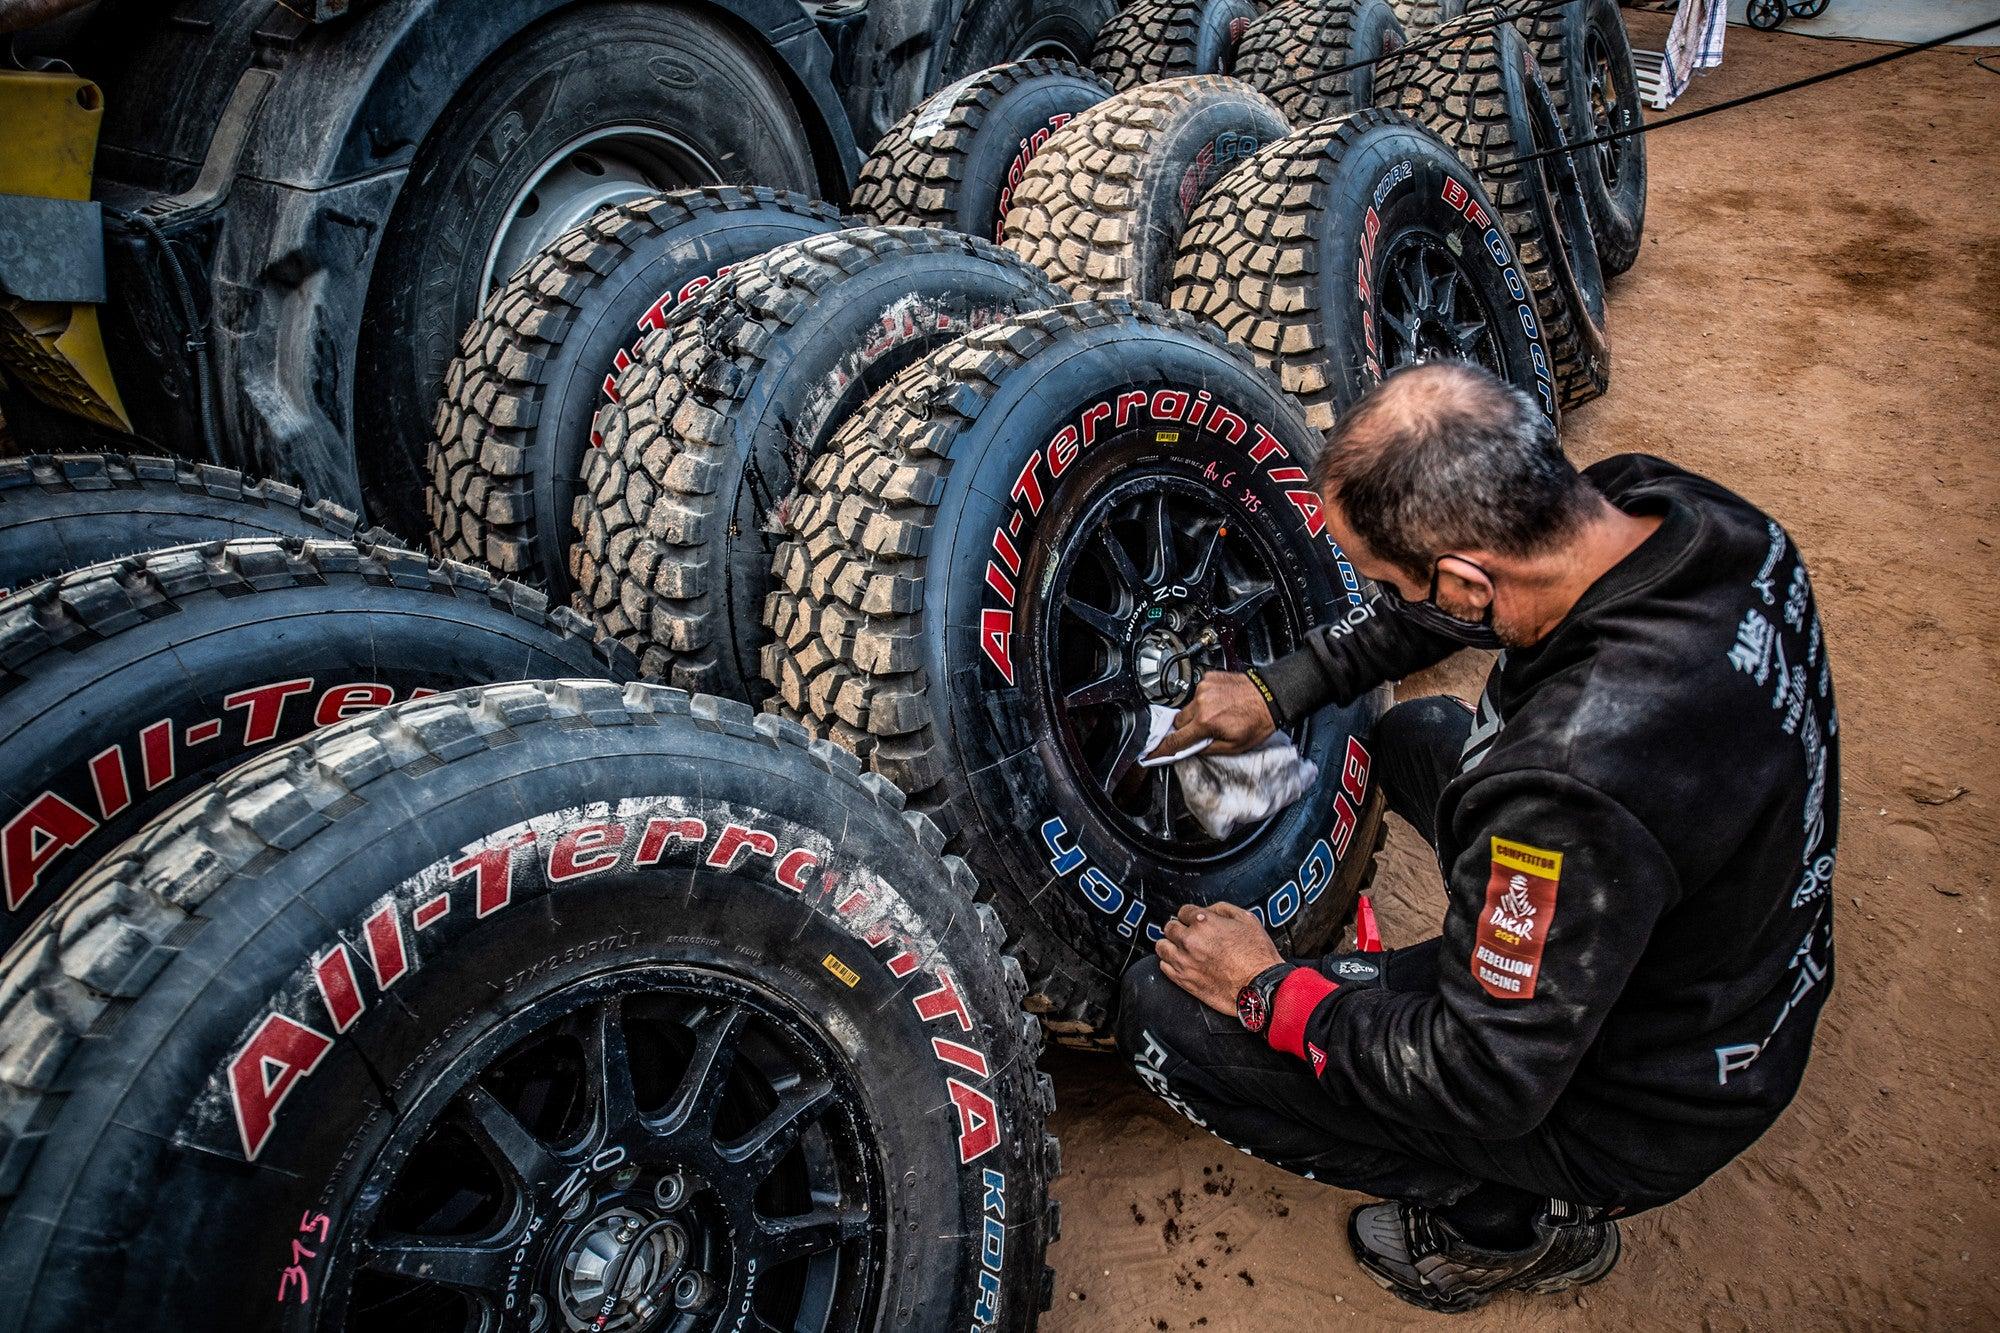 Bfgoodrich Tires Claim 17th Dakar Win With Stéphane Peterhansel And Edouard Boulanger